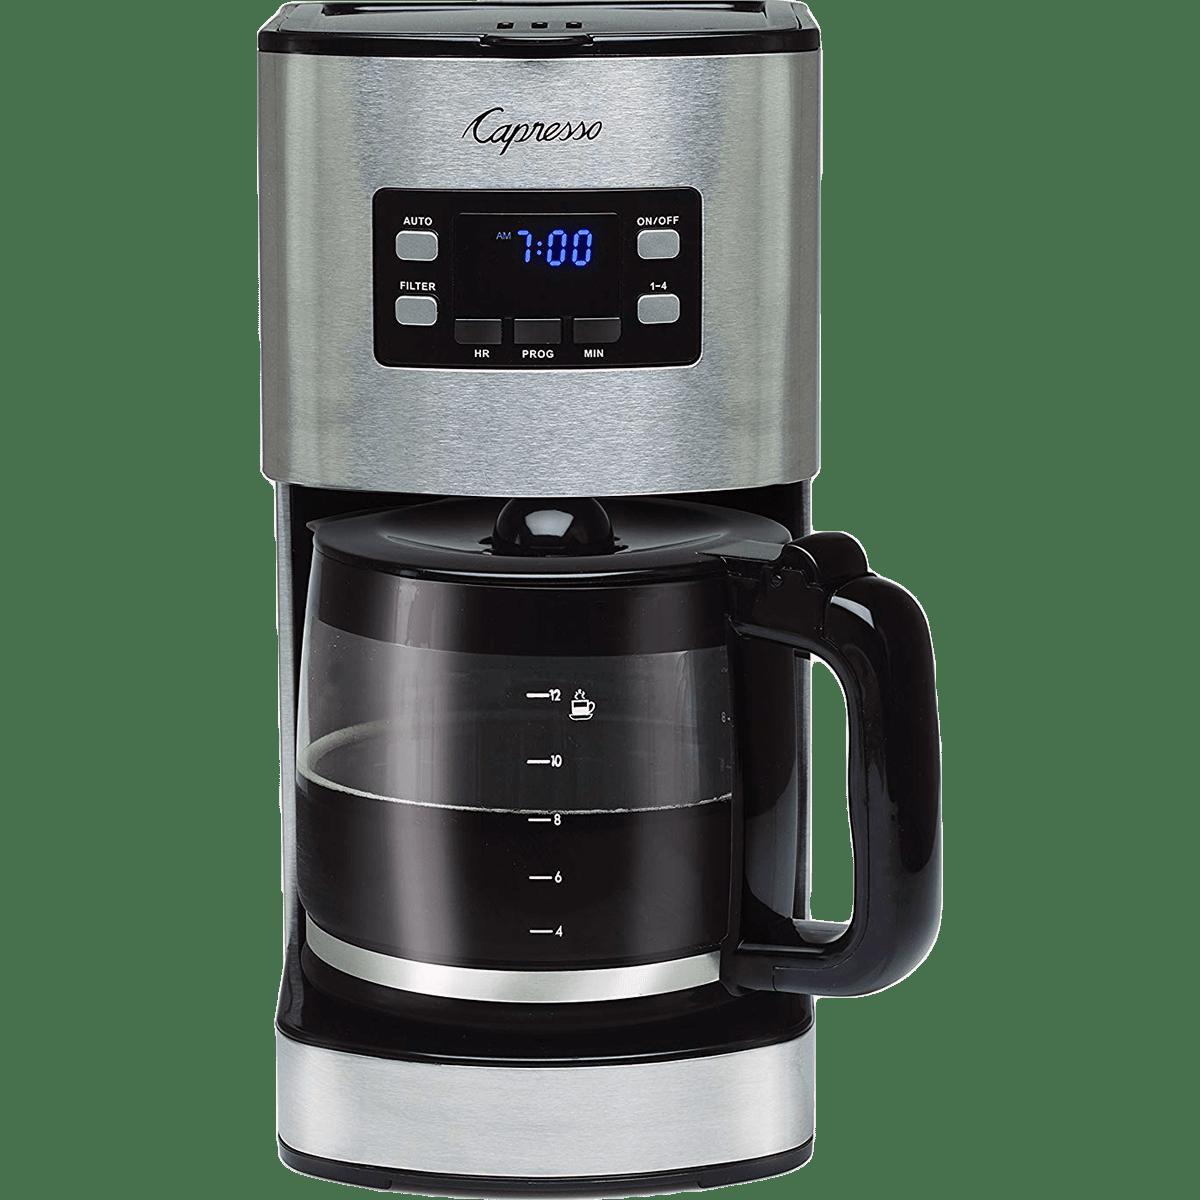 Capresso 427.05 Coffee Maker Stainless Steel